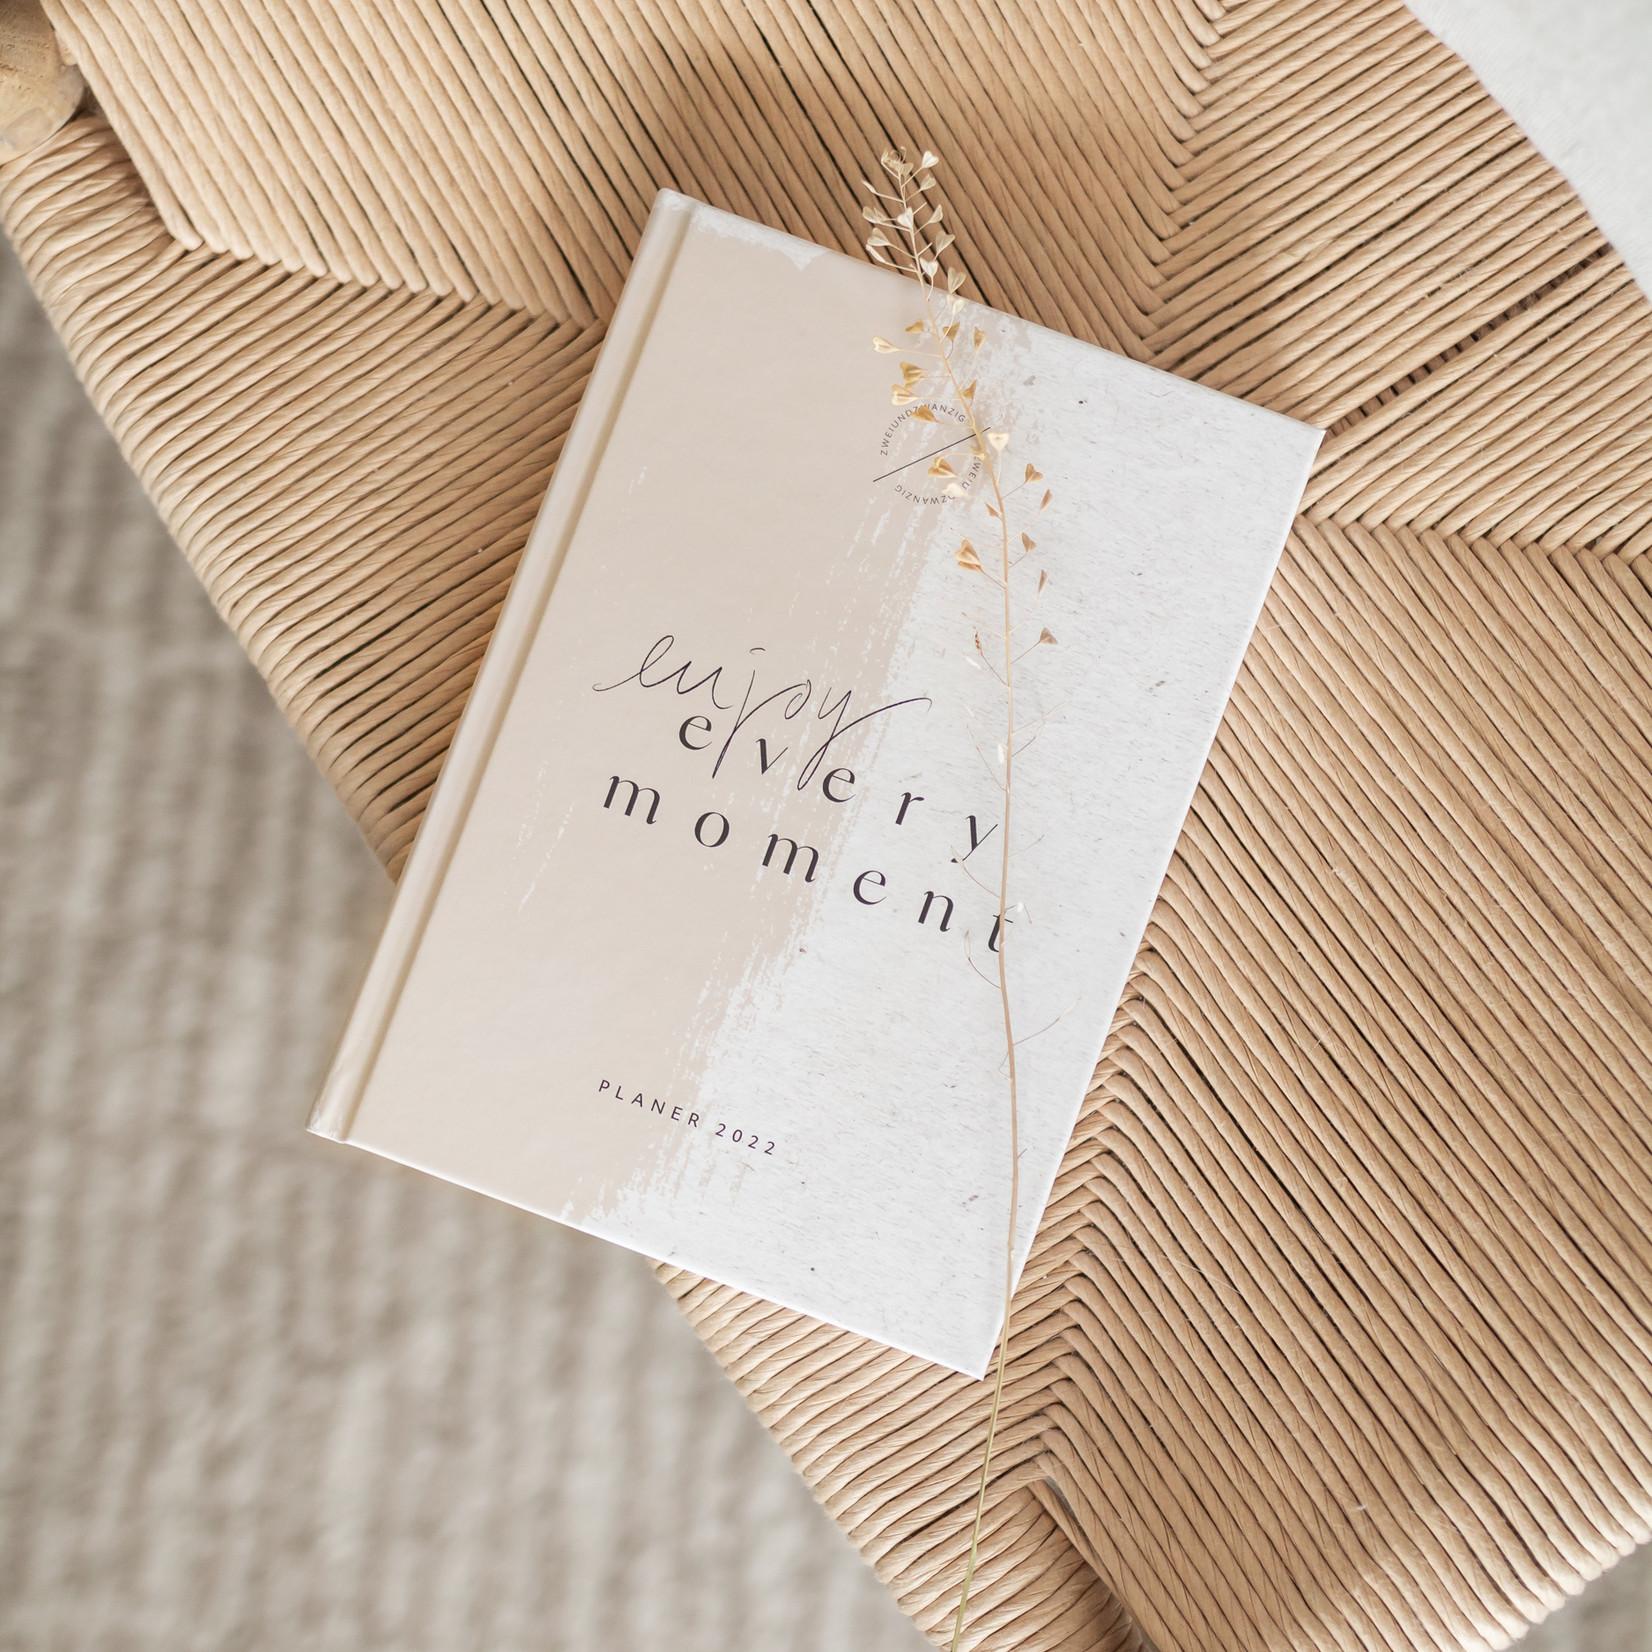 Jacqui Designs  Taschenkalender – Enjoy every moment